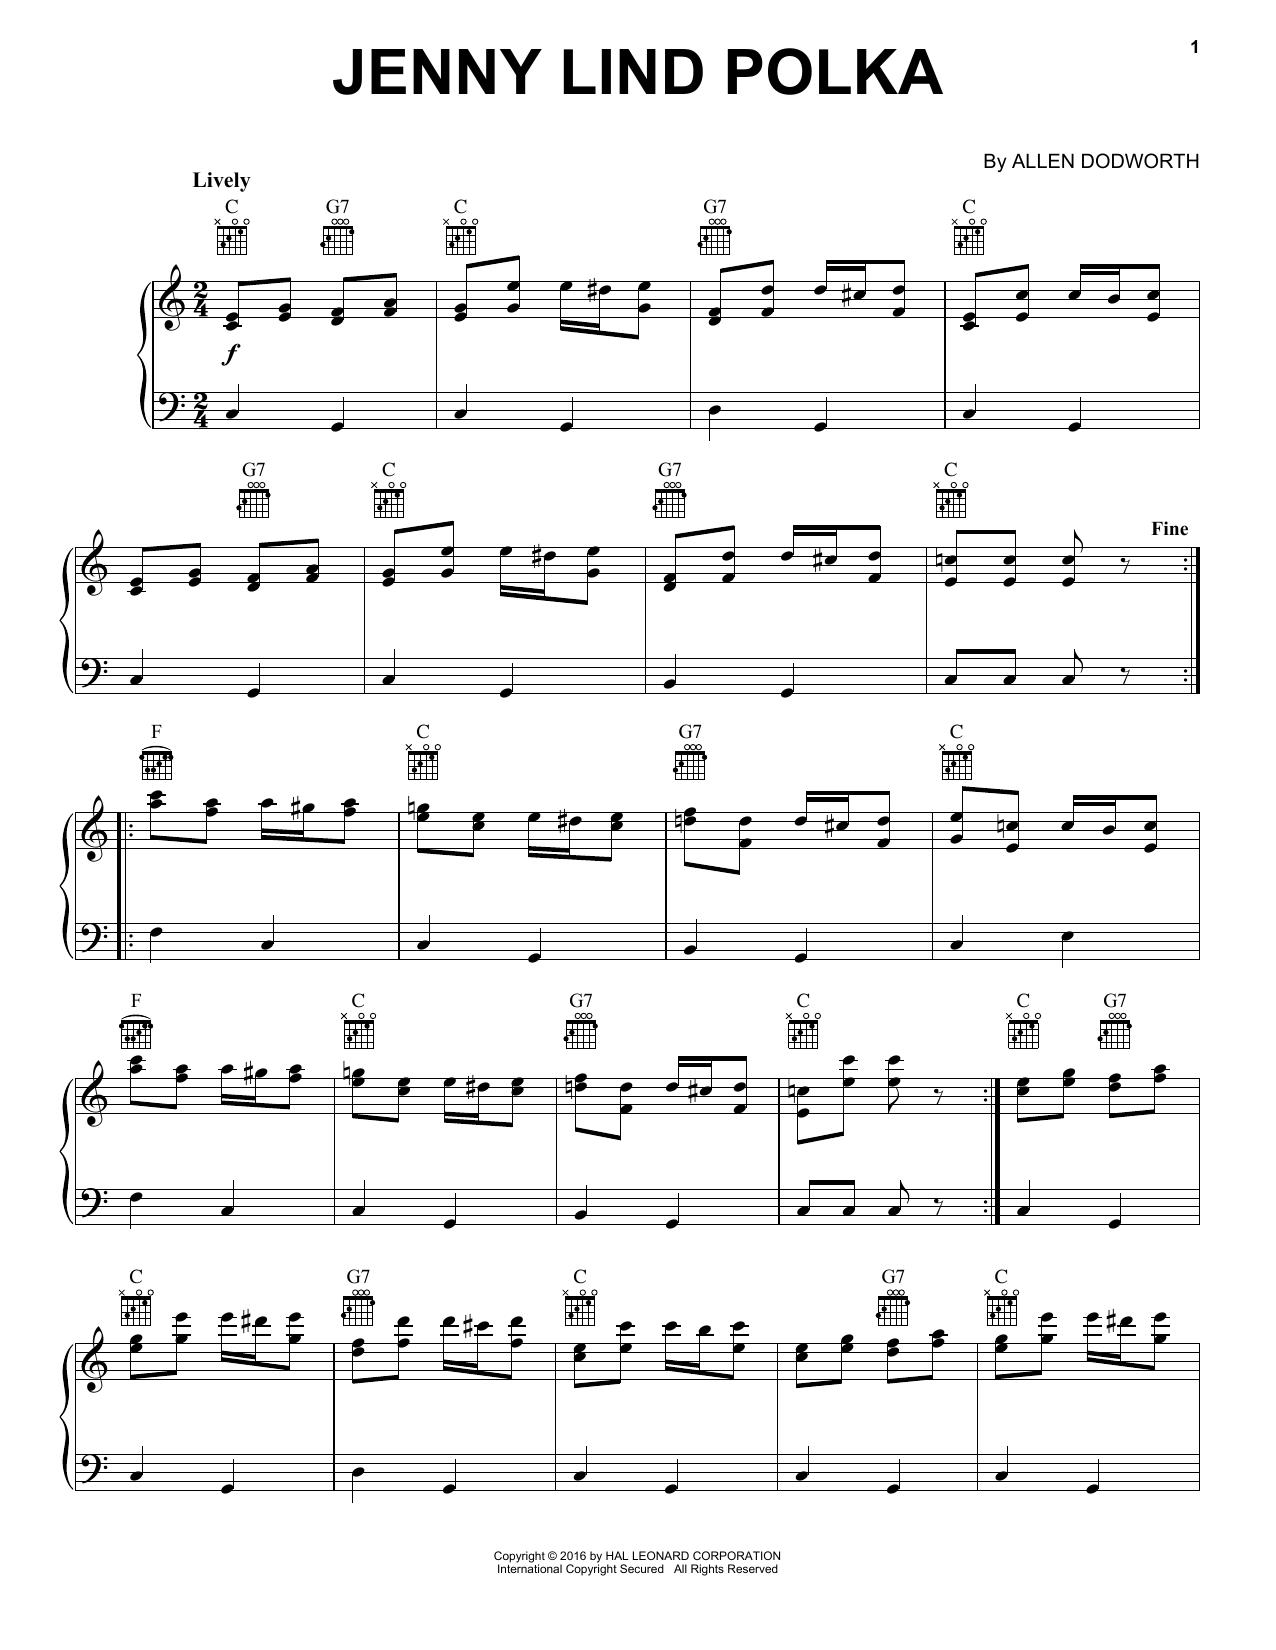 Allan Dodworth - Jenny Lind Polka